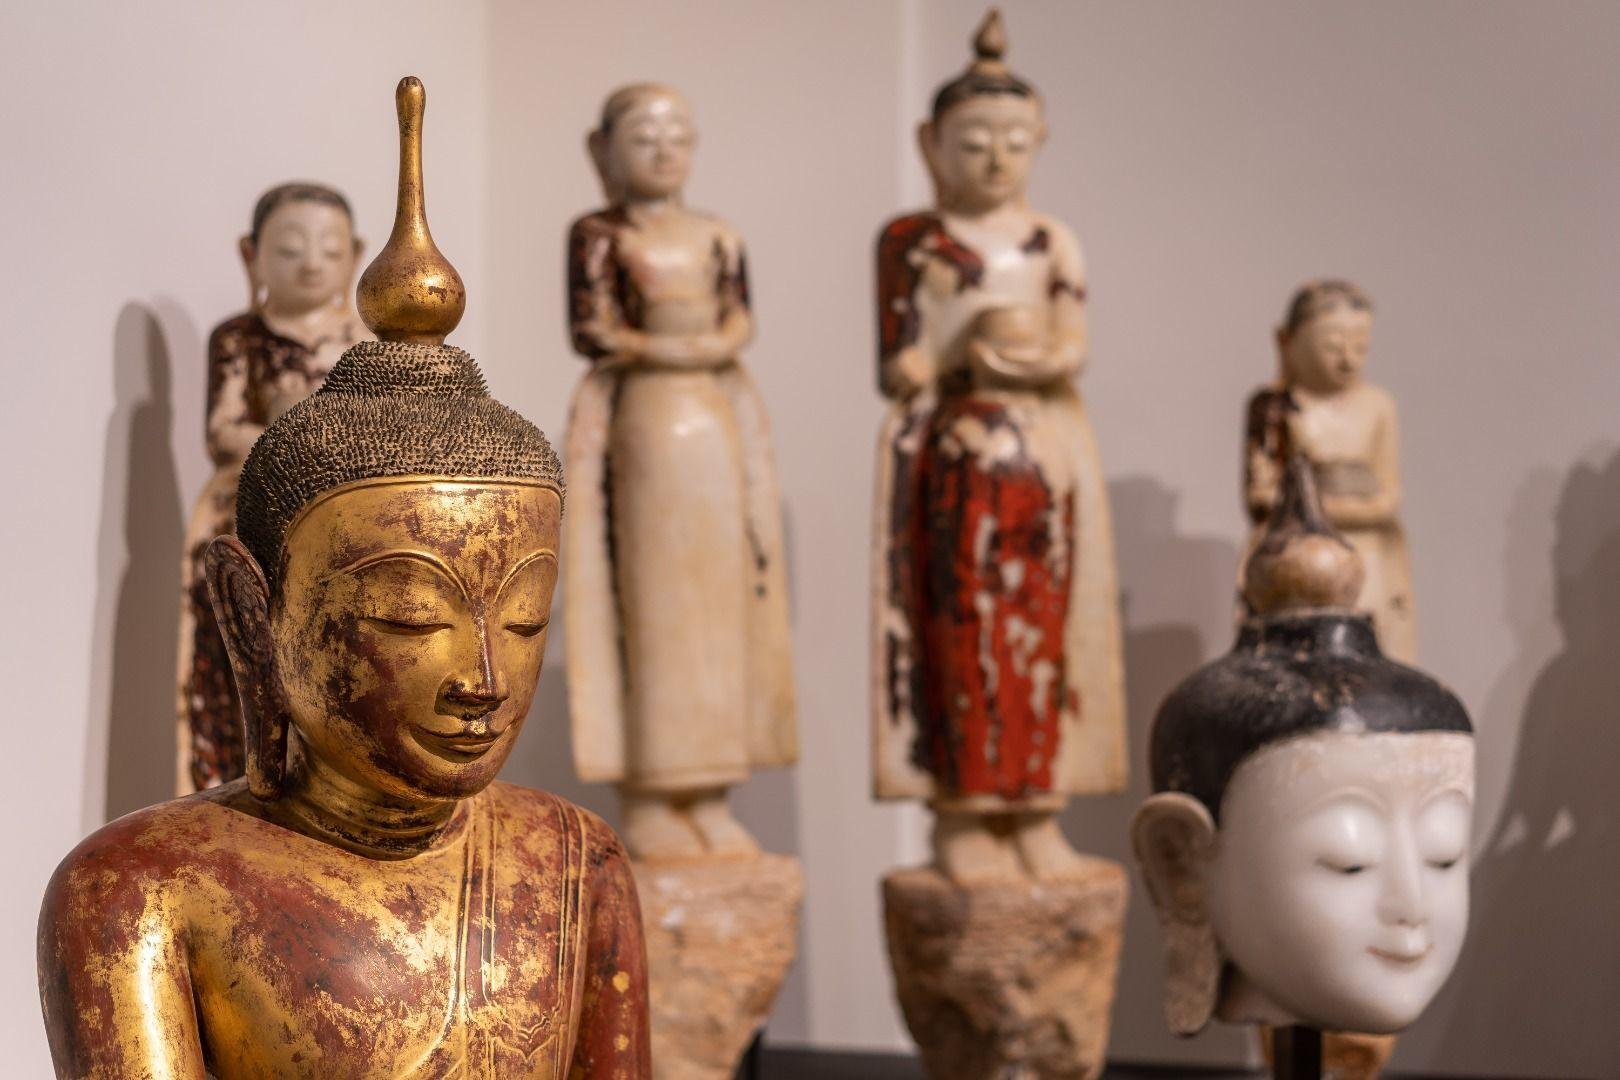 Museum der Völker - Museum of Ethnology